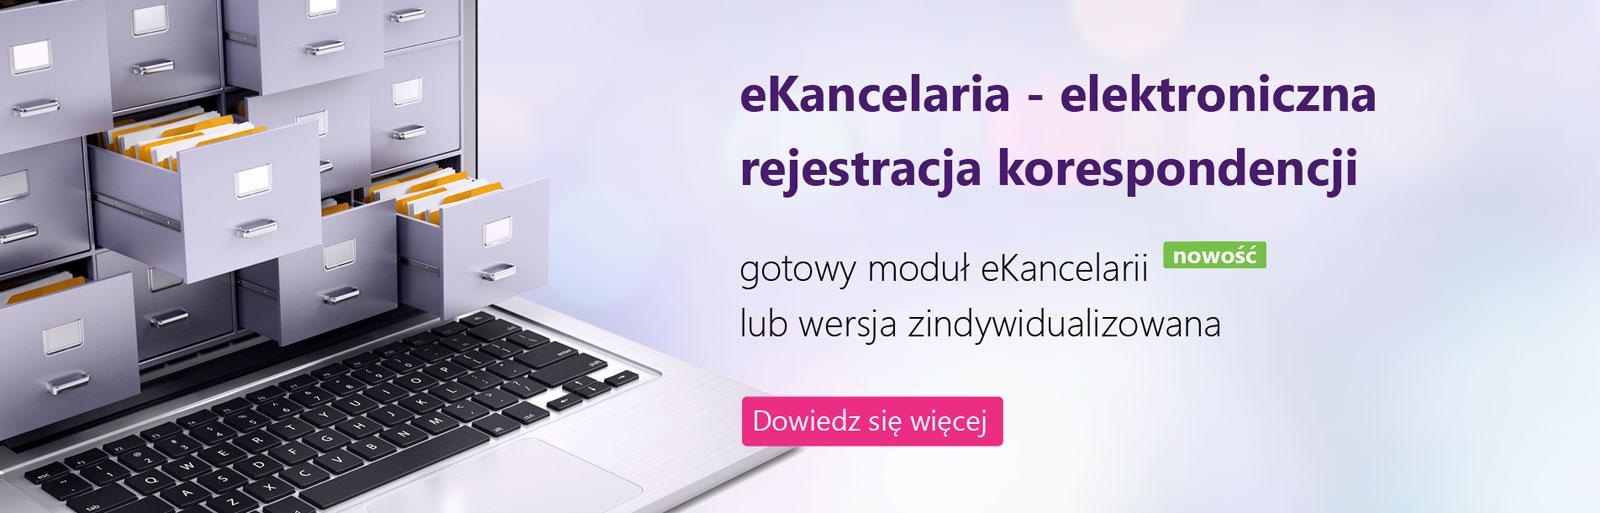 elliteq-ekancelaria-slide